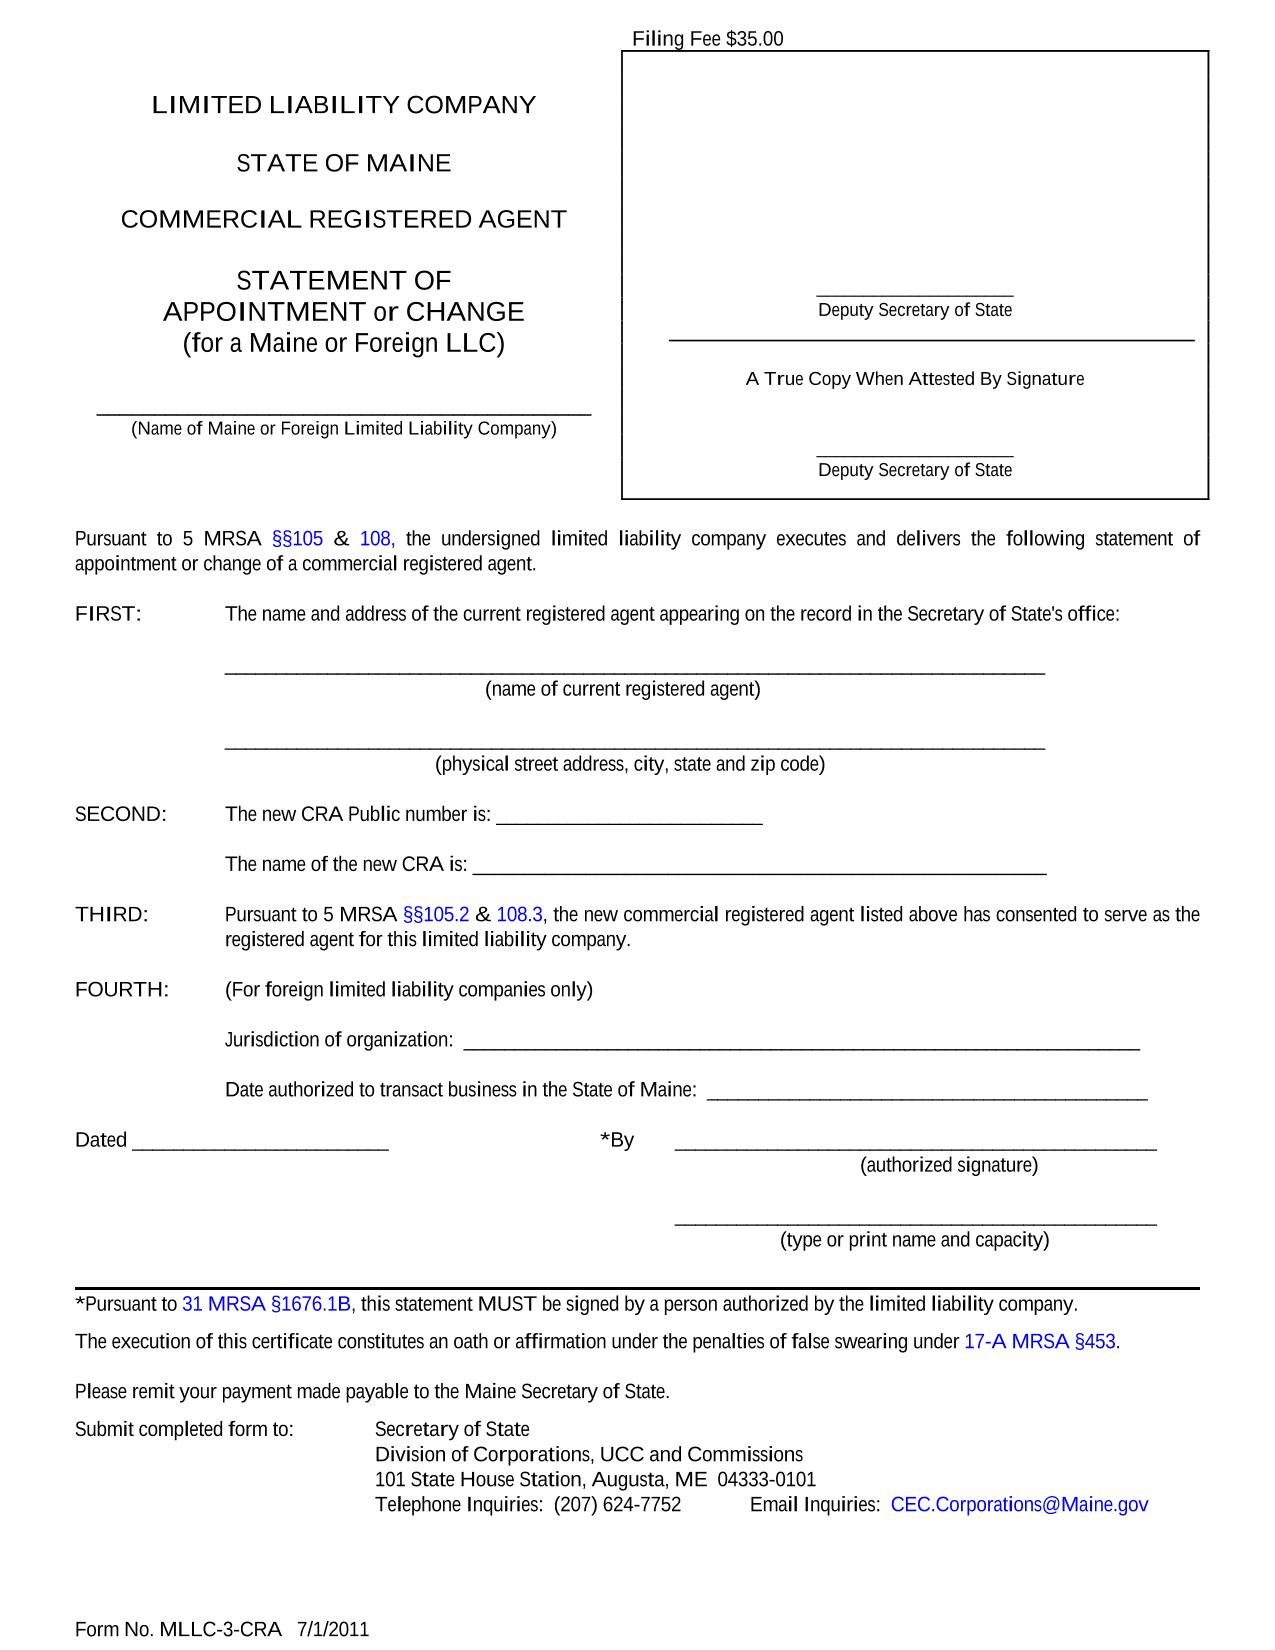 maine-llc-registered-agent-statement-of-resignation-